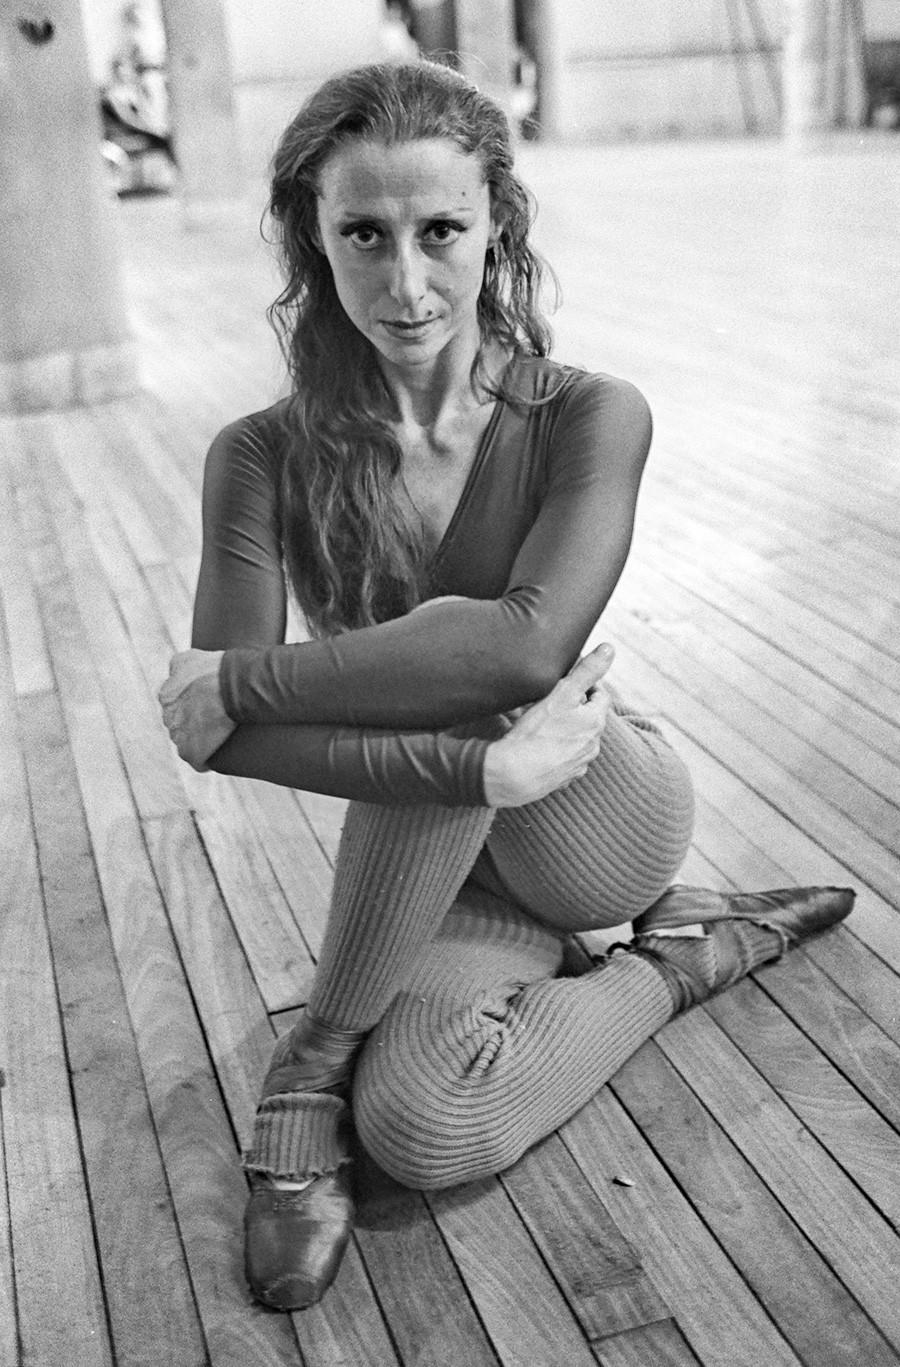 Maja Plisetskaja durante le prove nel Teatro Colón, Buenos Aires, Argentina, 1976